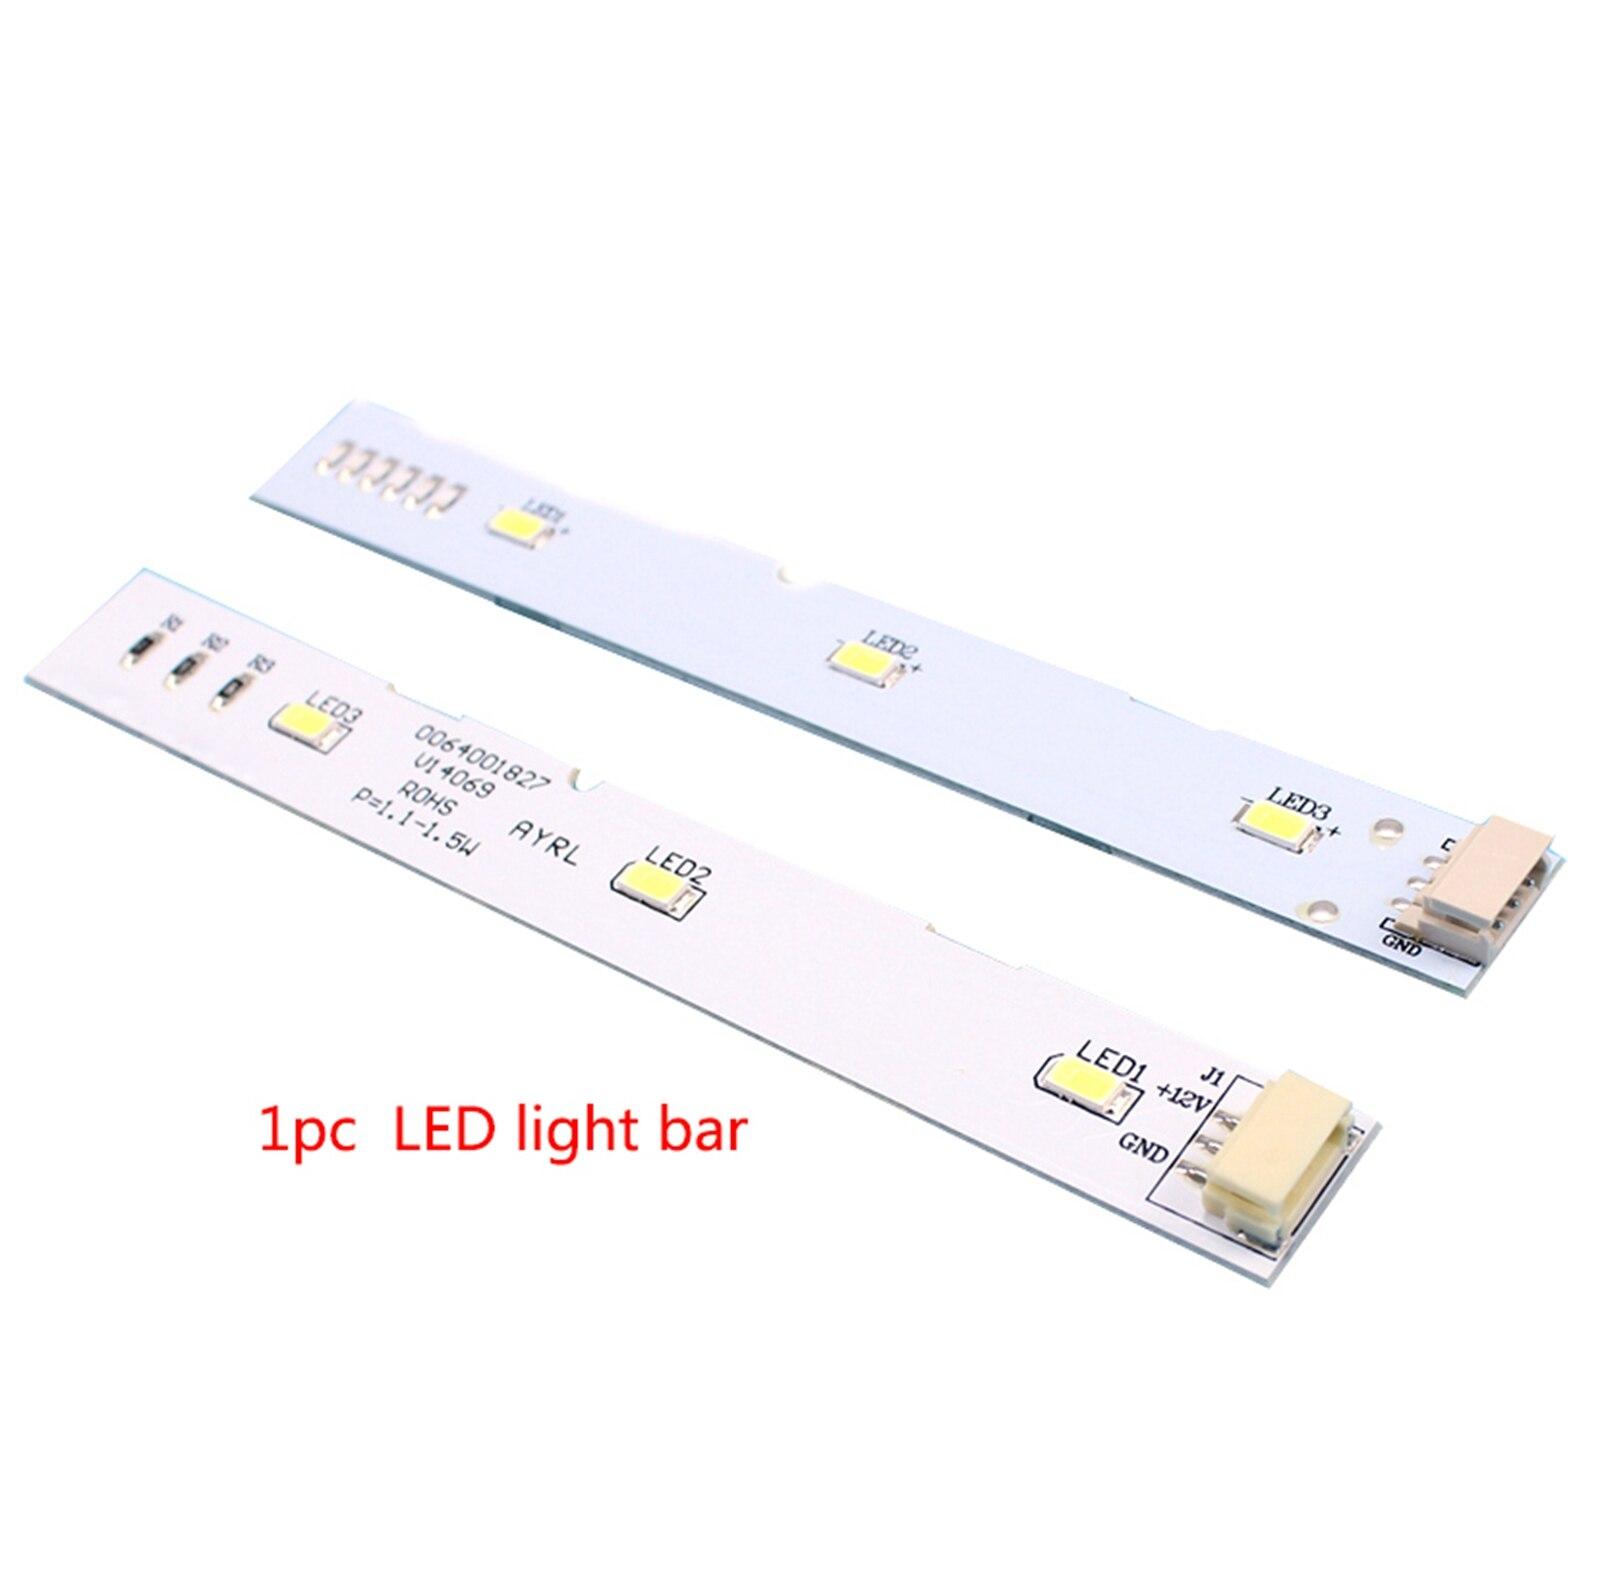 1PC Refrigerator LED Lamp Bar For Haier BCD-575WDBI 0064001827 Front-door Refrigerator LED Lamp Bar